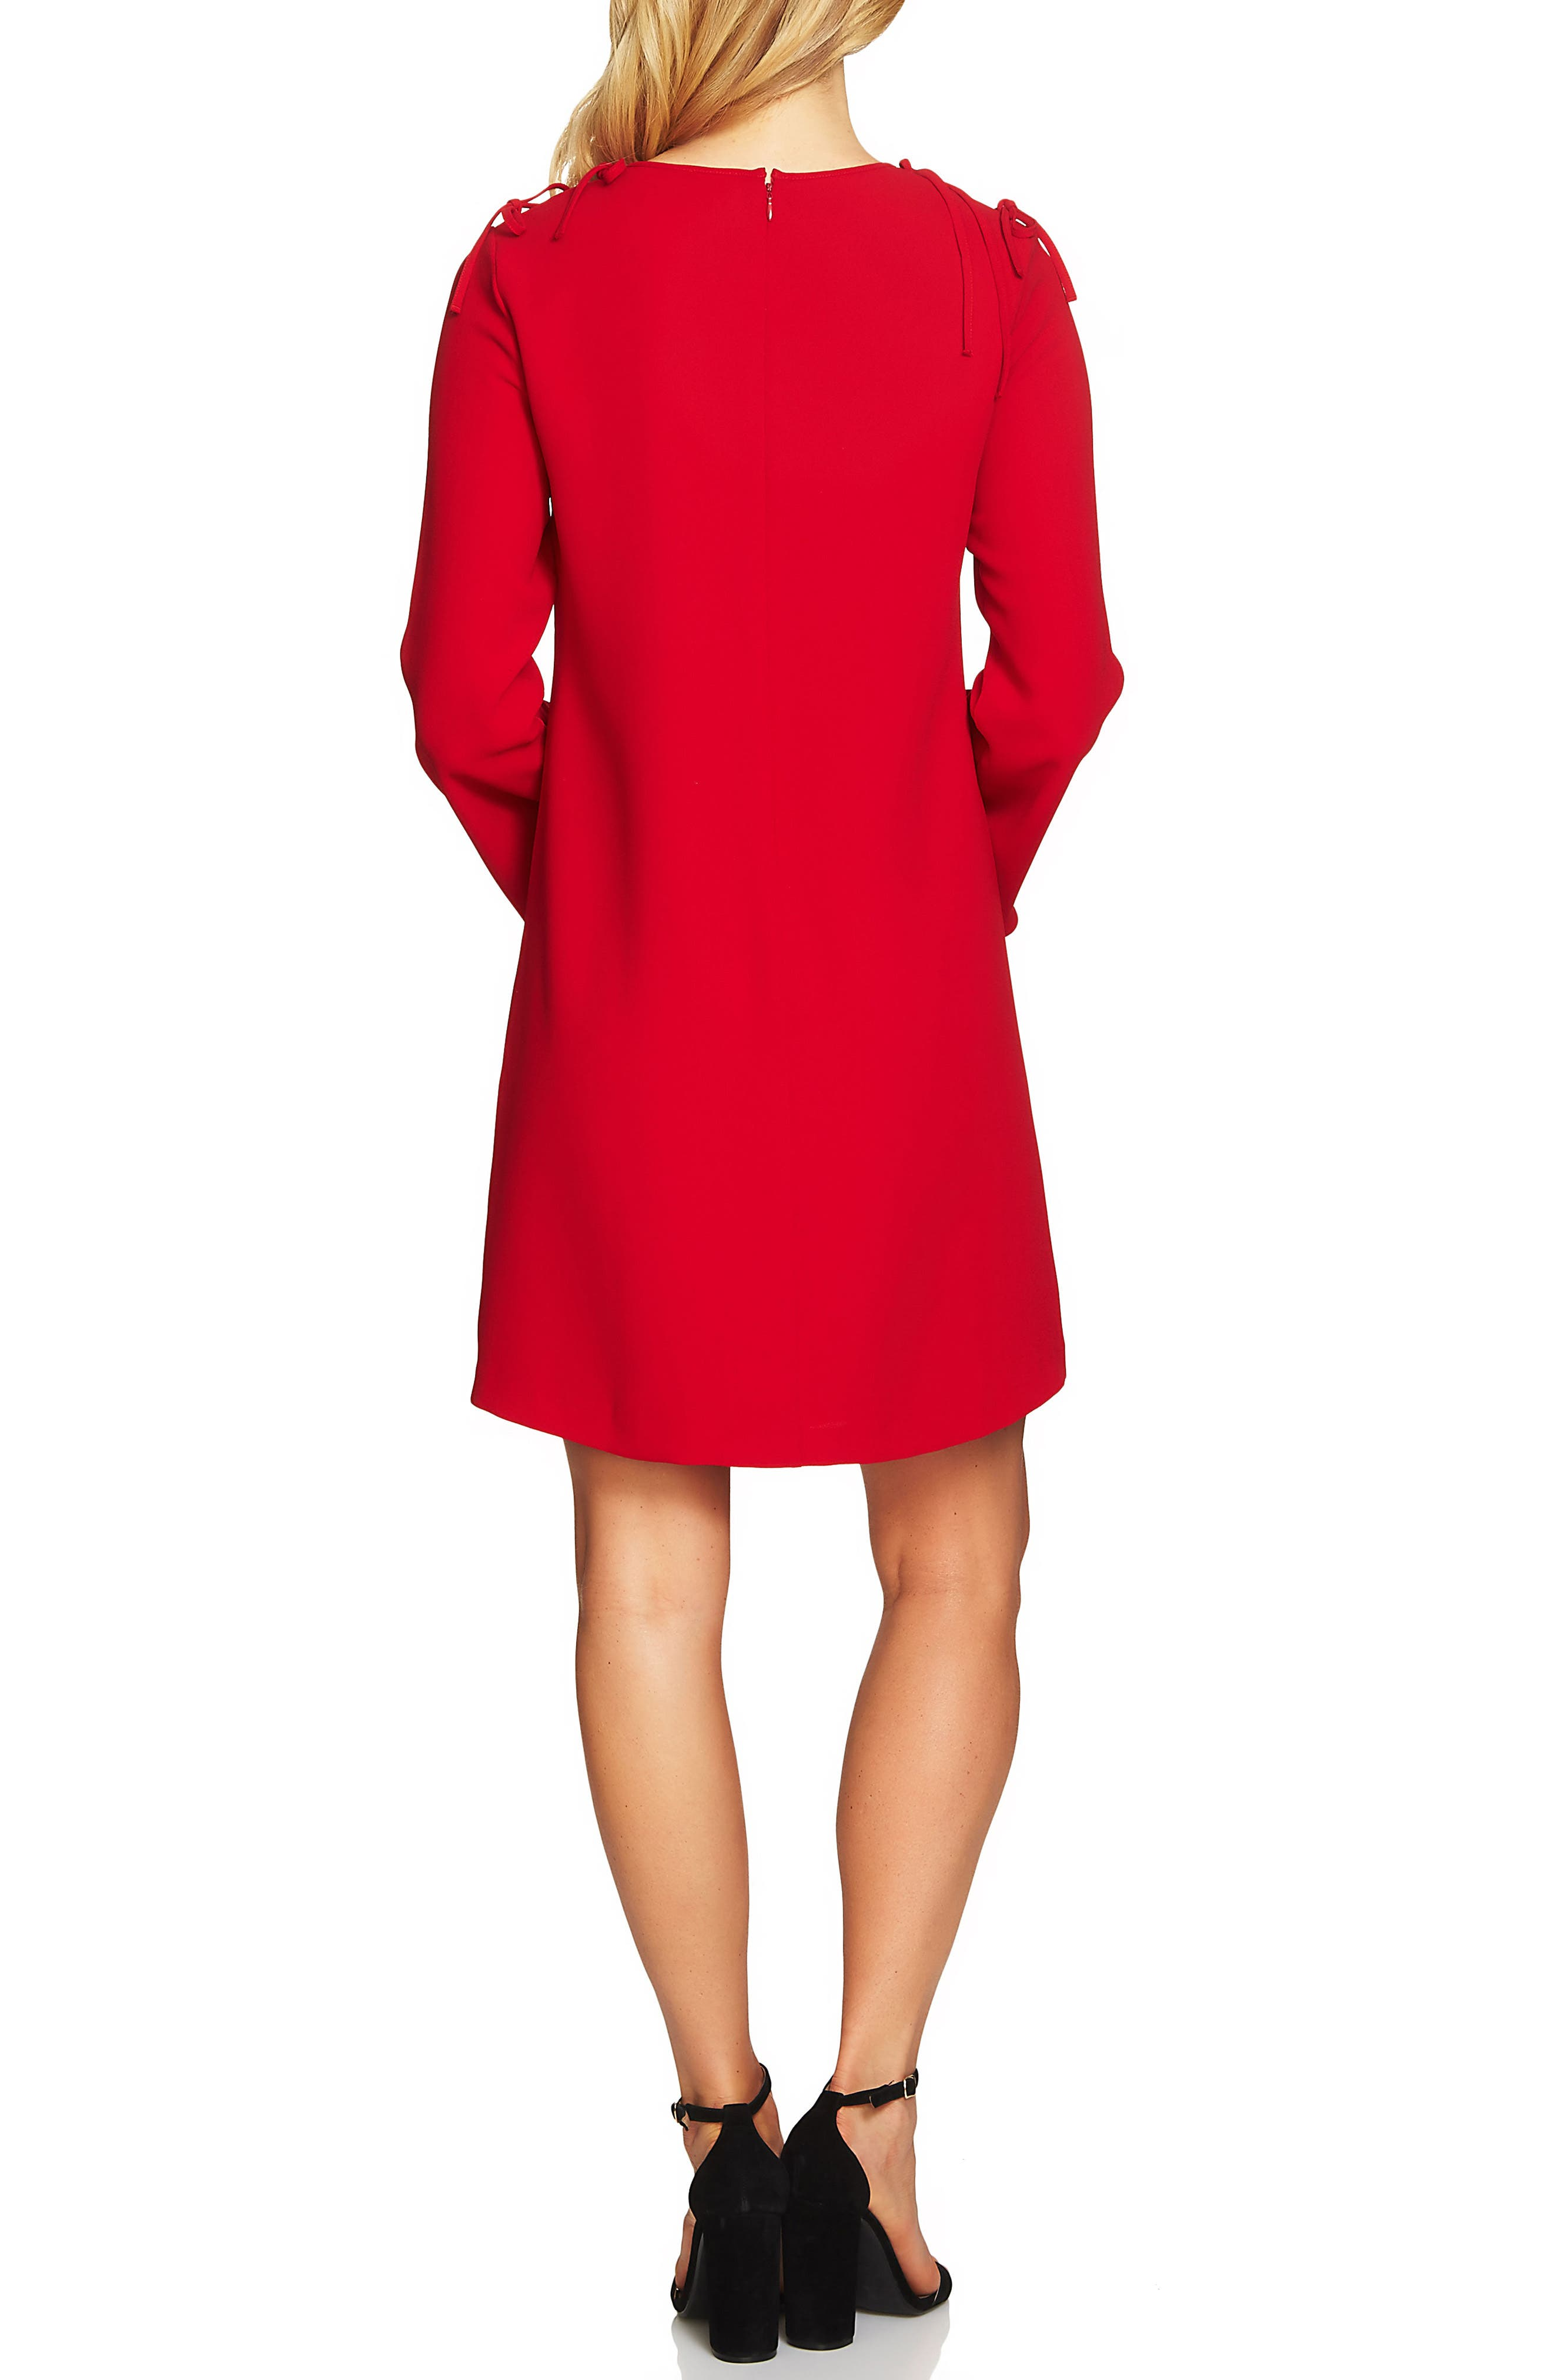 Moss Tie Shoulder Bell Sleeve Shift Dress,                             Alternate thumbnail 2, color,                             Ribbon Red